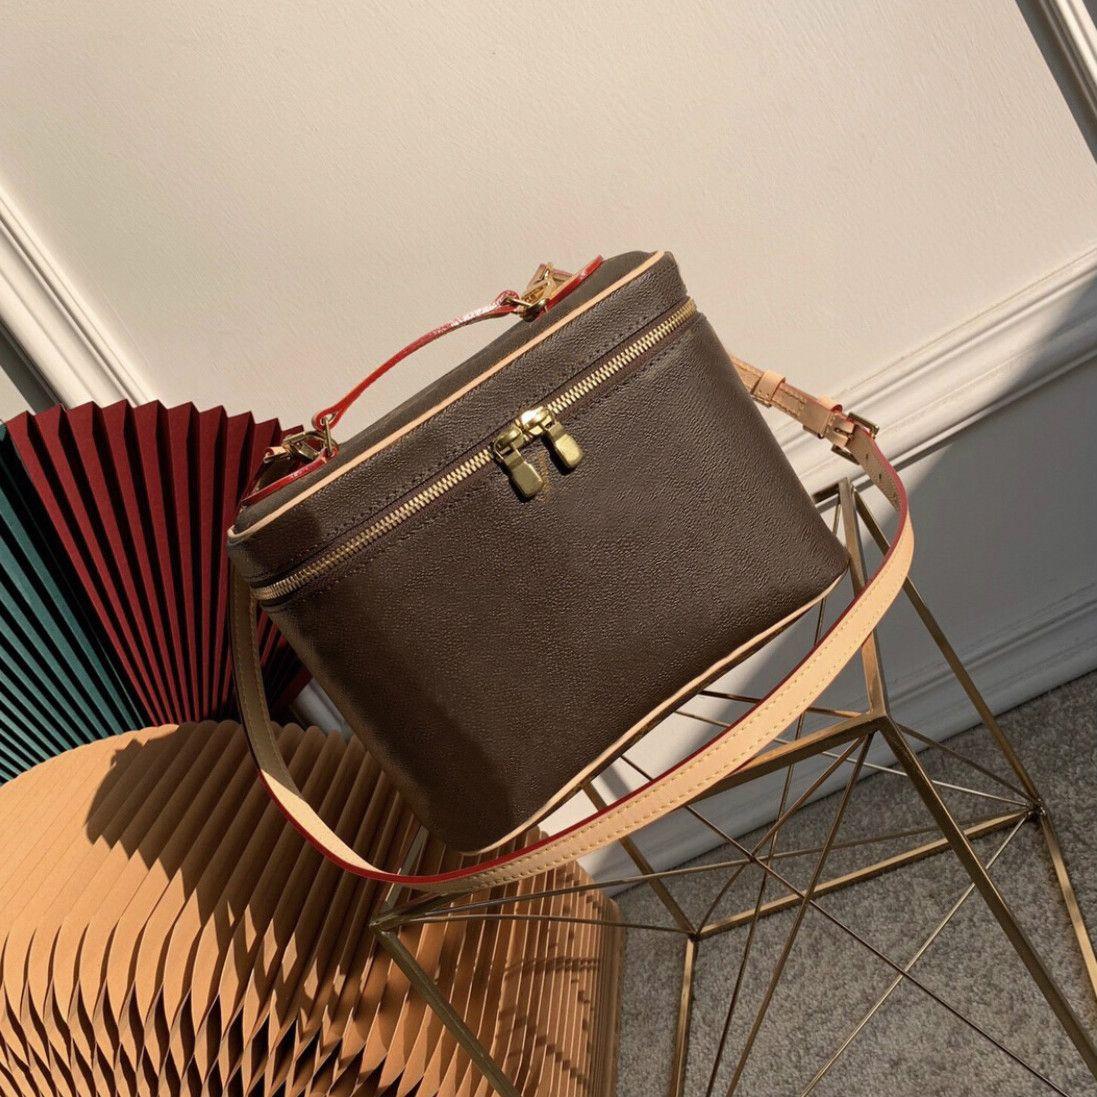 Balde do saco para mulheres de couro saco cosmético clássico ombro cosmético bolsa de bolsa de bolsa de bolsa de bolsa de bolsa de bolsa capa de caso de bolsa whol hvbef